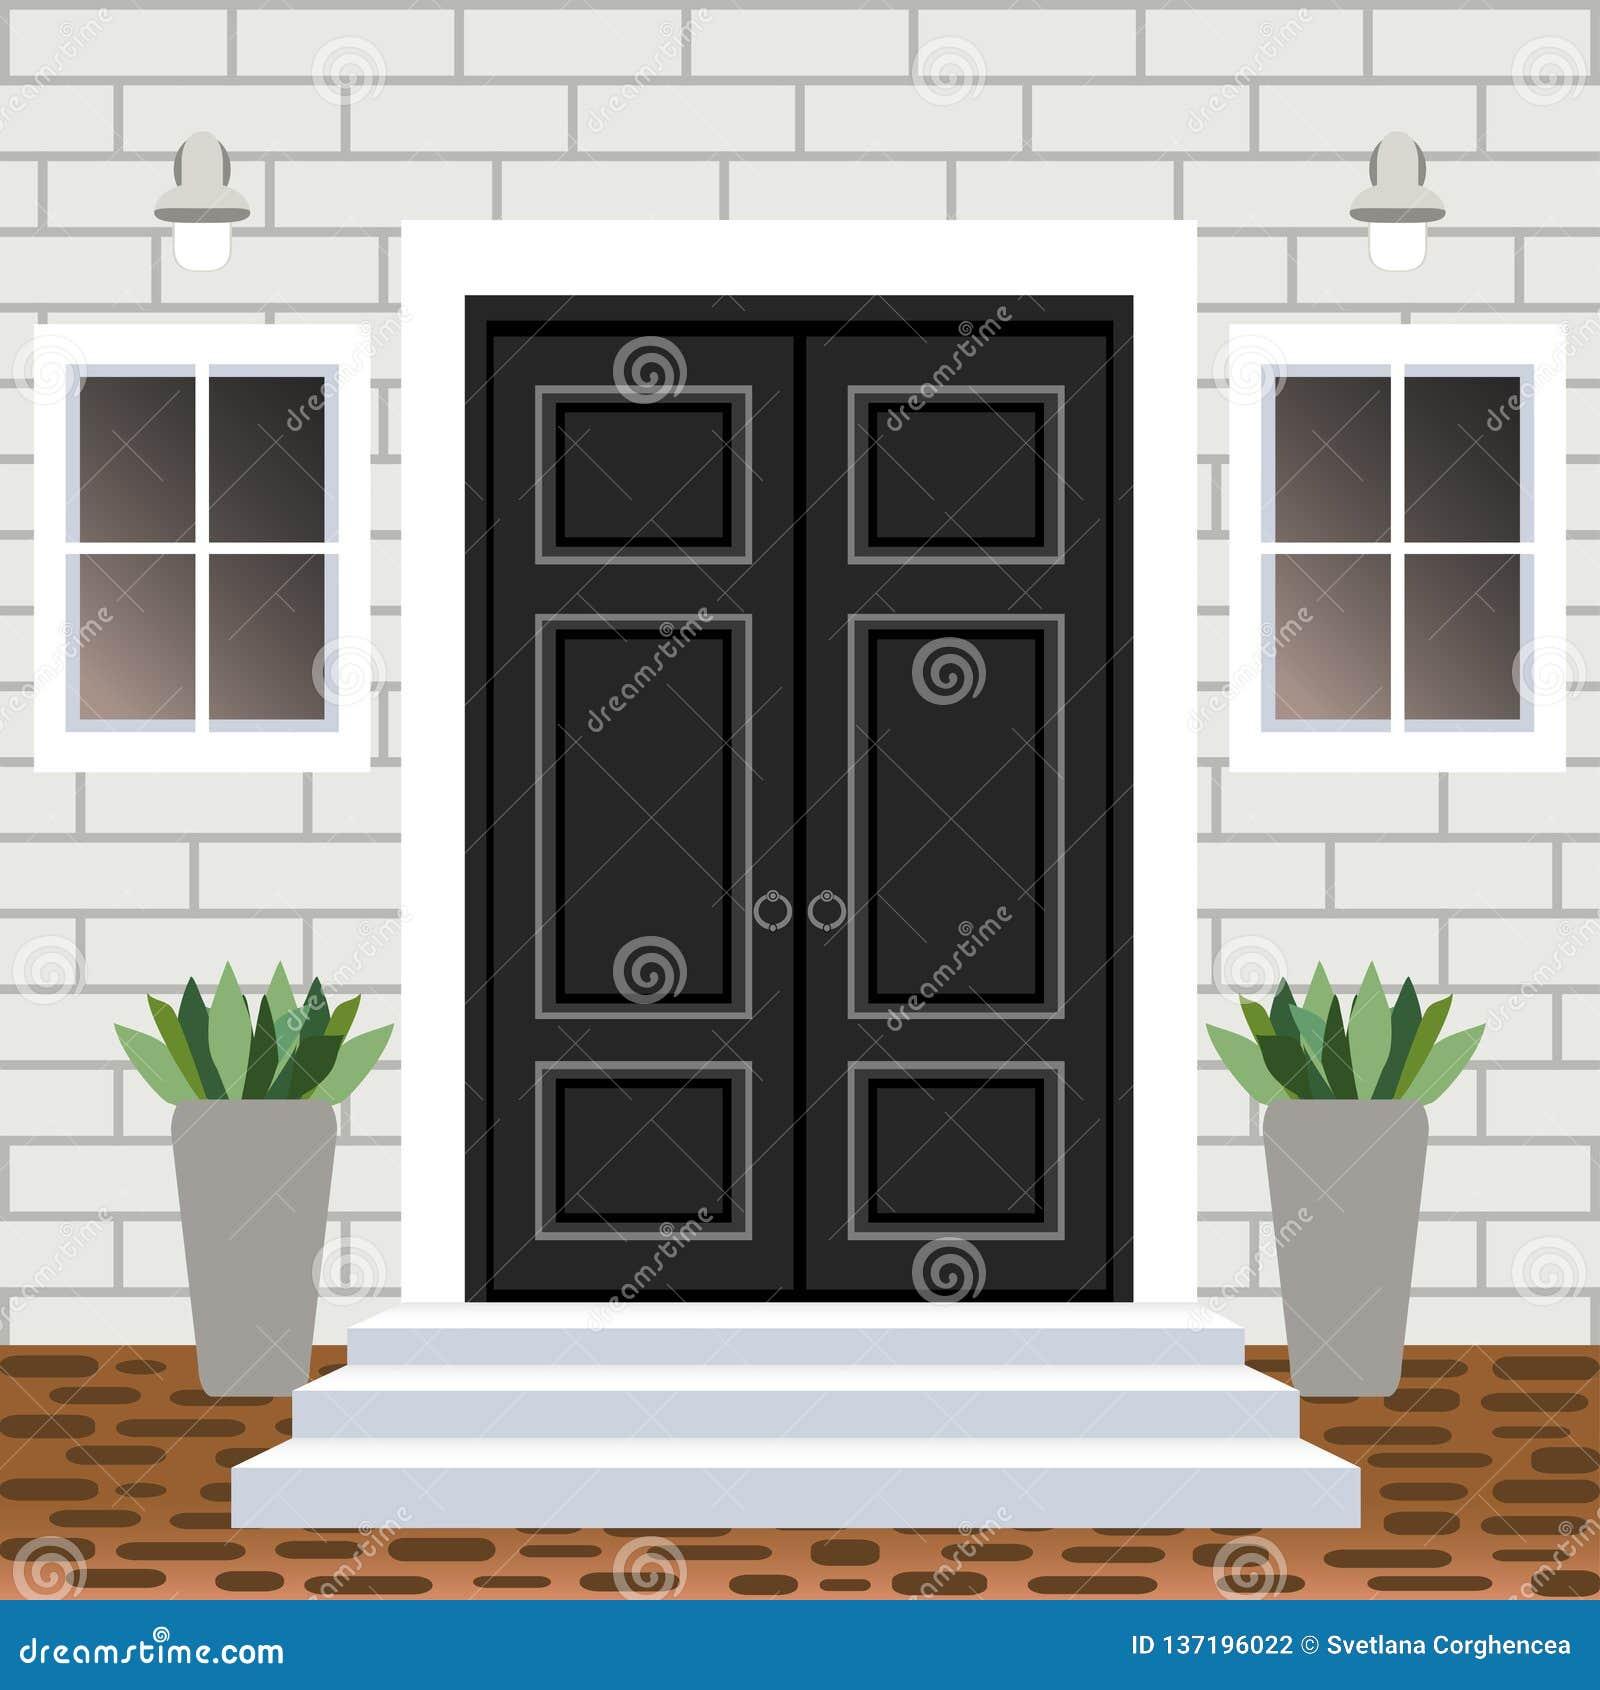 House Door Front With Doorstep And Steps Porch, Window